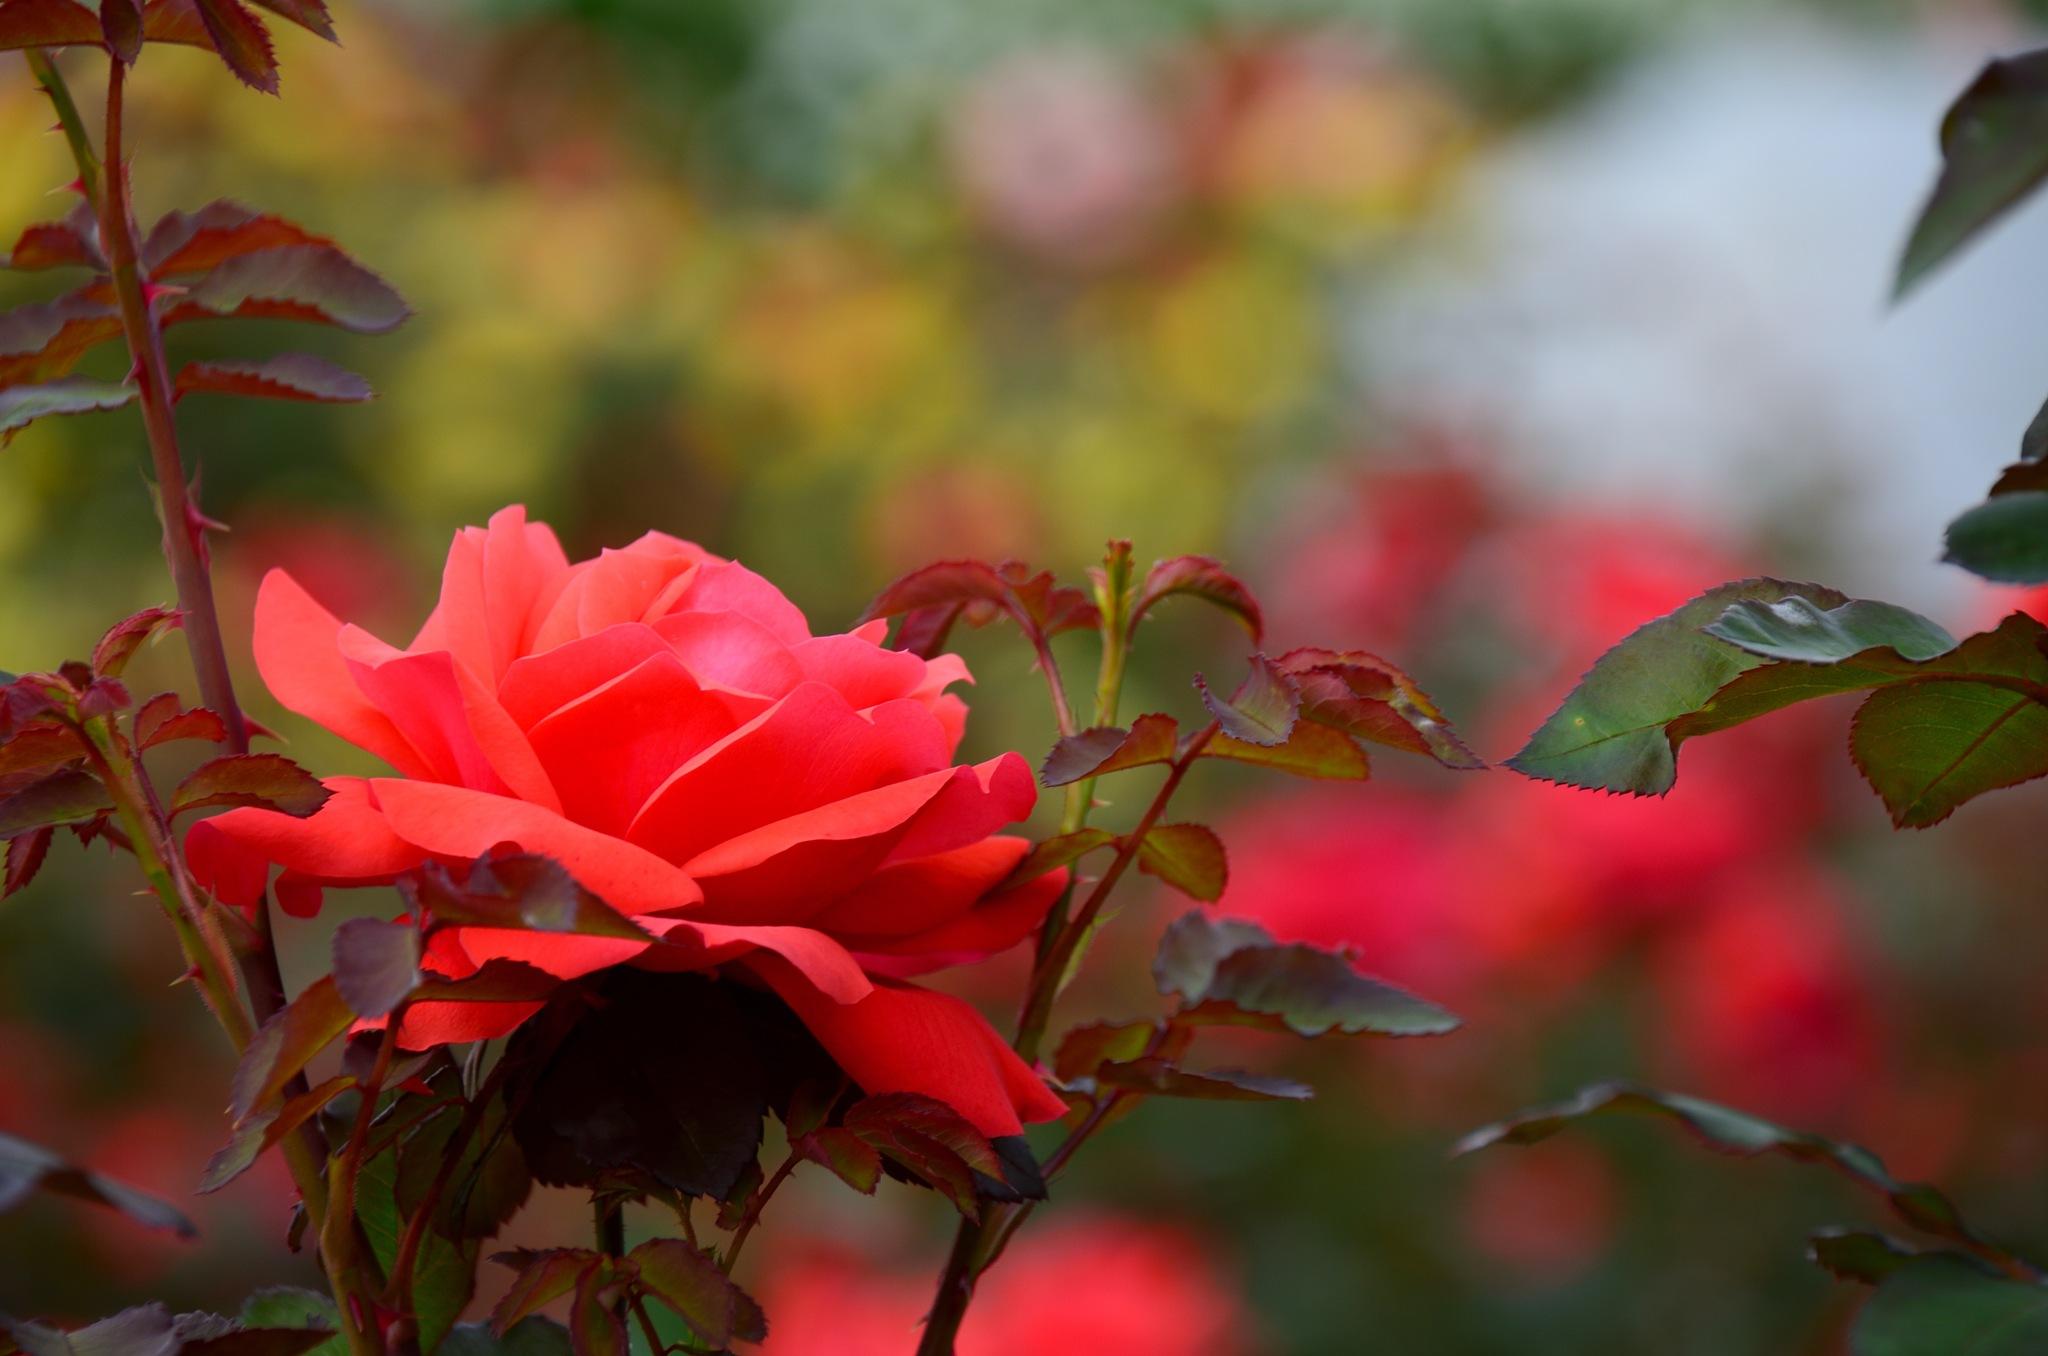 rose garden by Masahiro  Asano